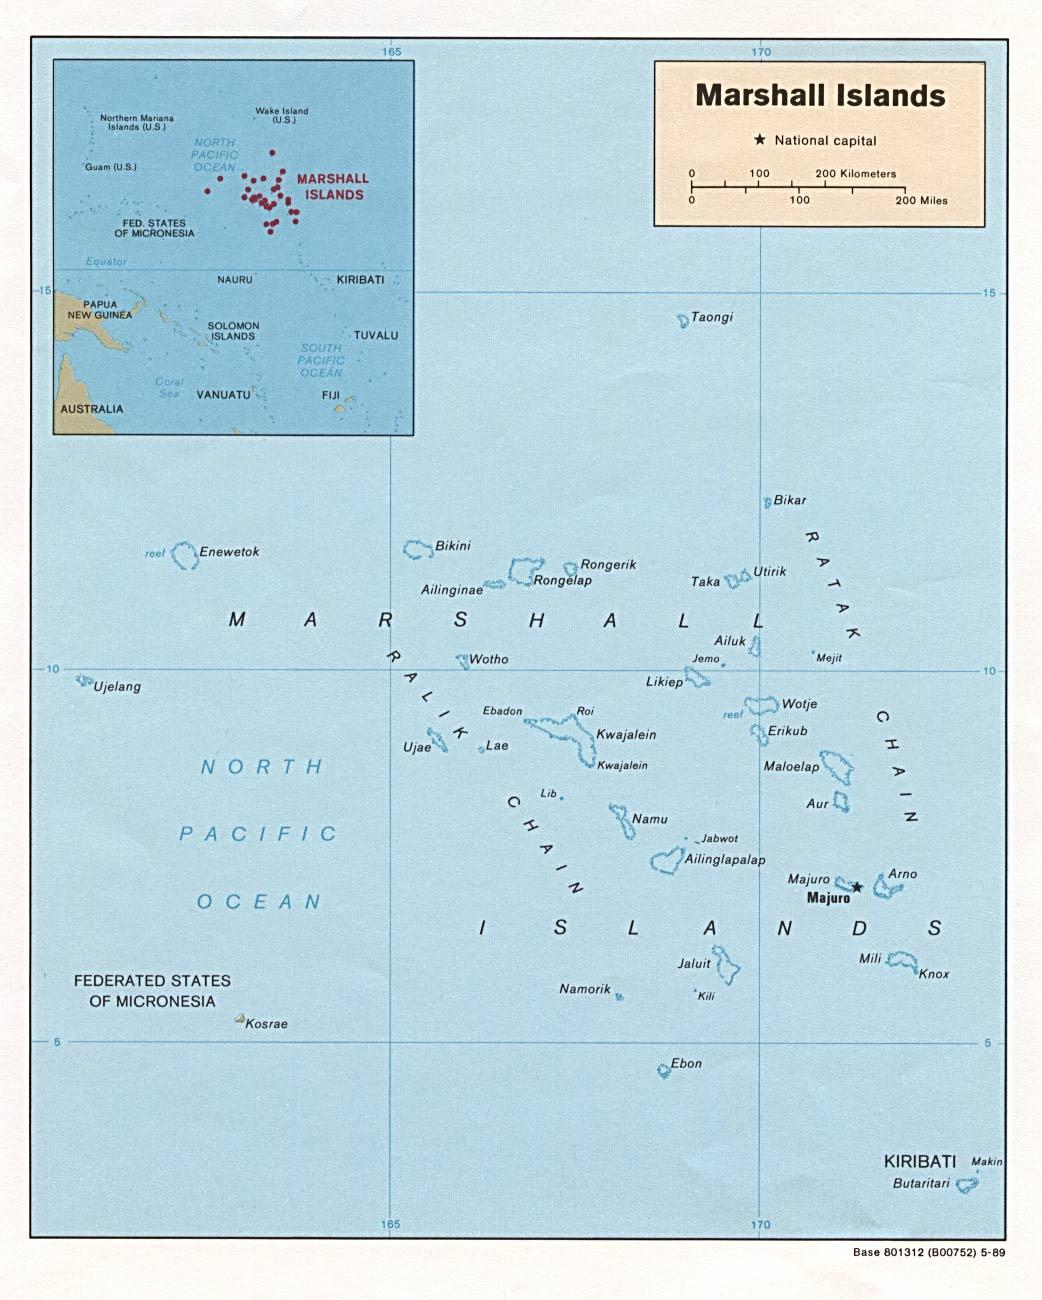 WPS Port of Majuro satellite map